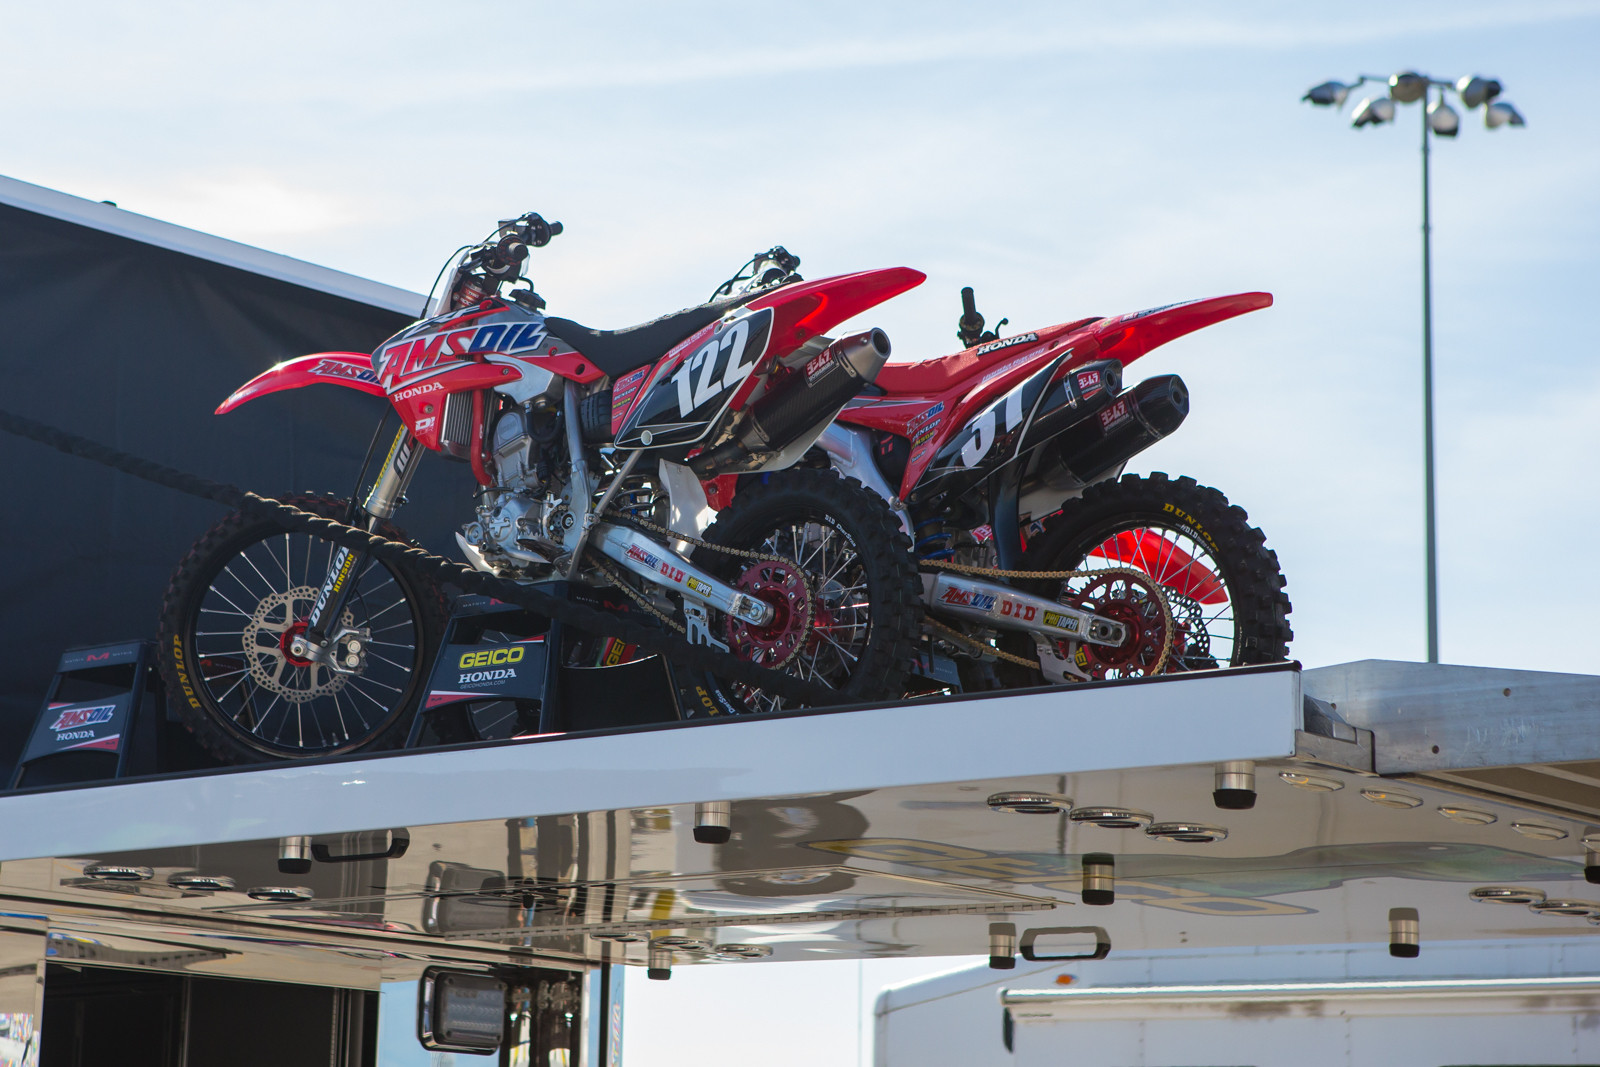 Factory Connection Honda - Vital MX Pit Bits: Daytona Supercross - Motocross Pictures - Vital MX